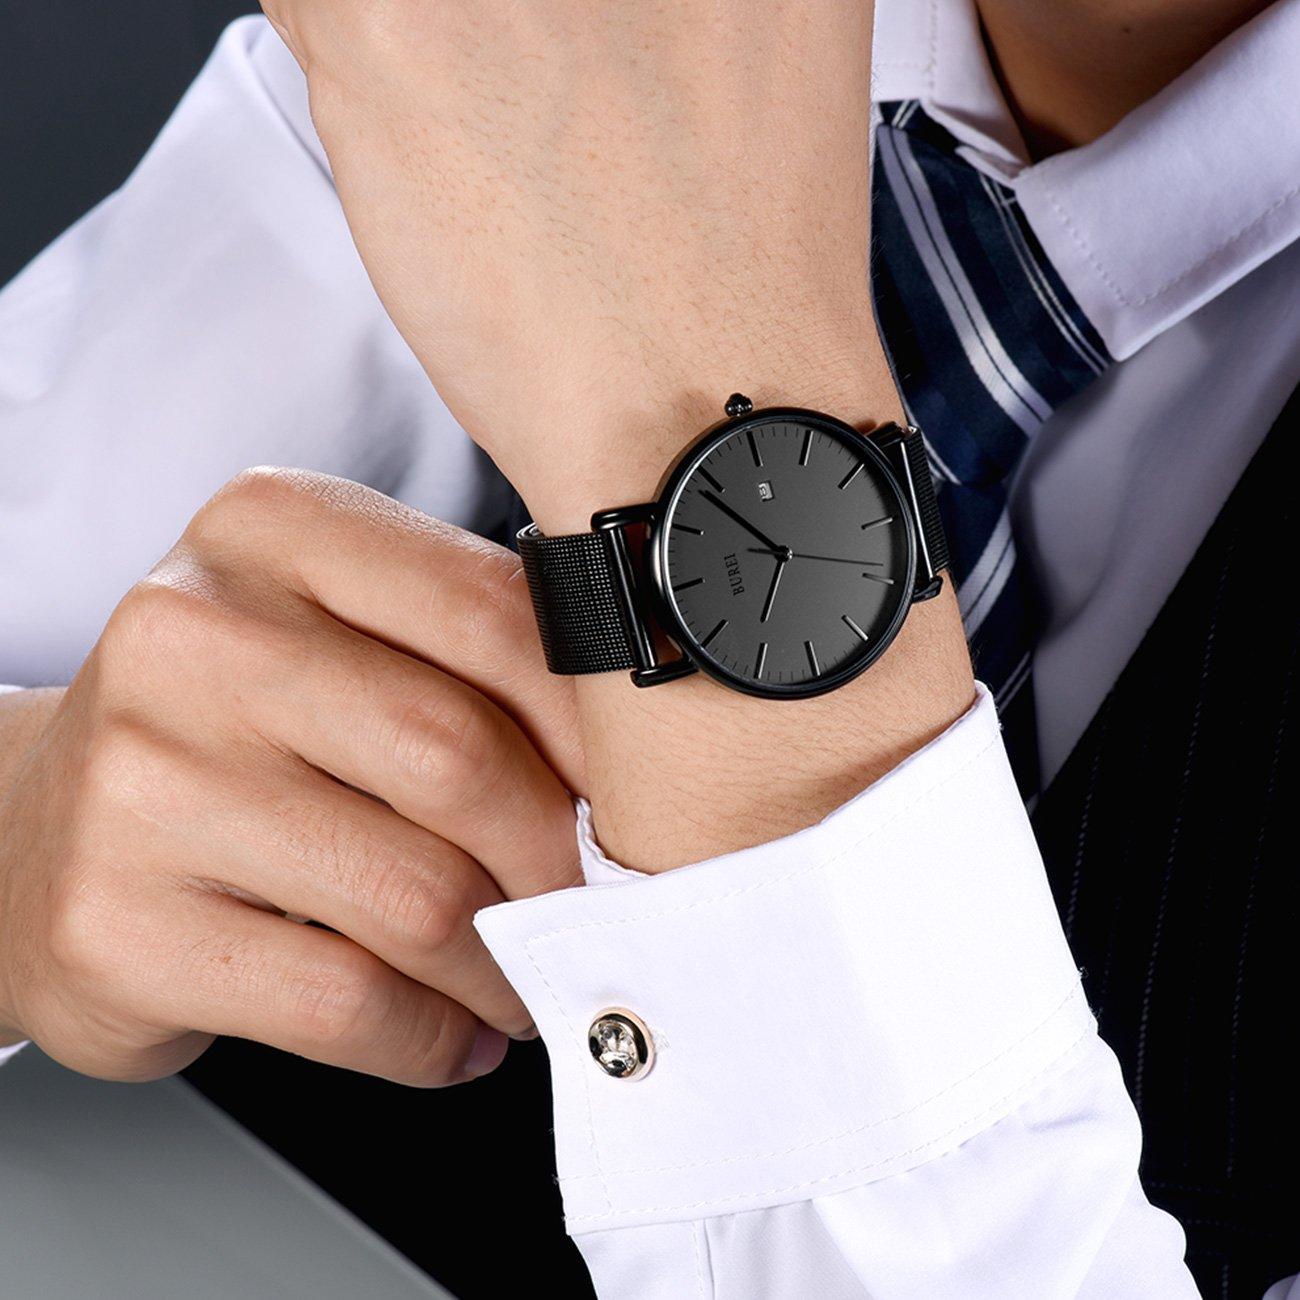 BUREI Men's Fashion Minimalist Wrist Watch Analog Deep Gray Date with Black Mesh Band by BUREI (Image #3)